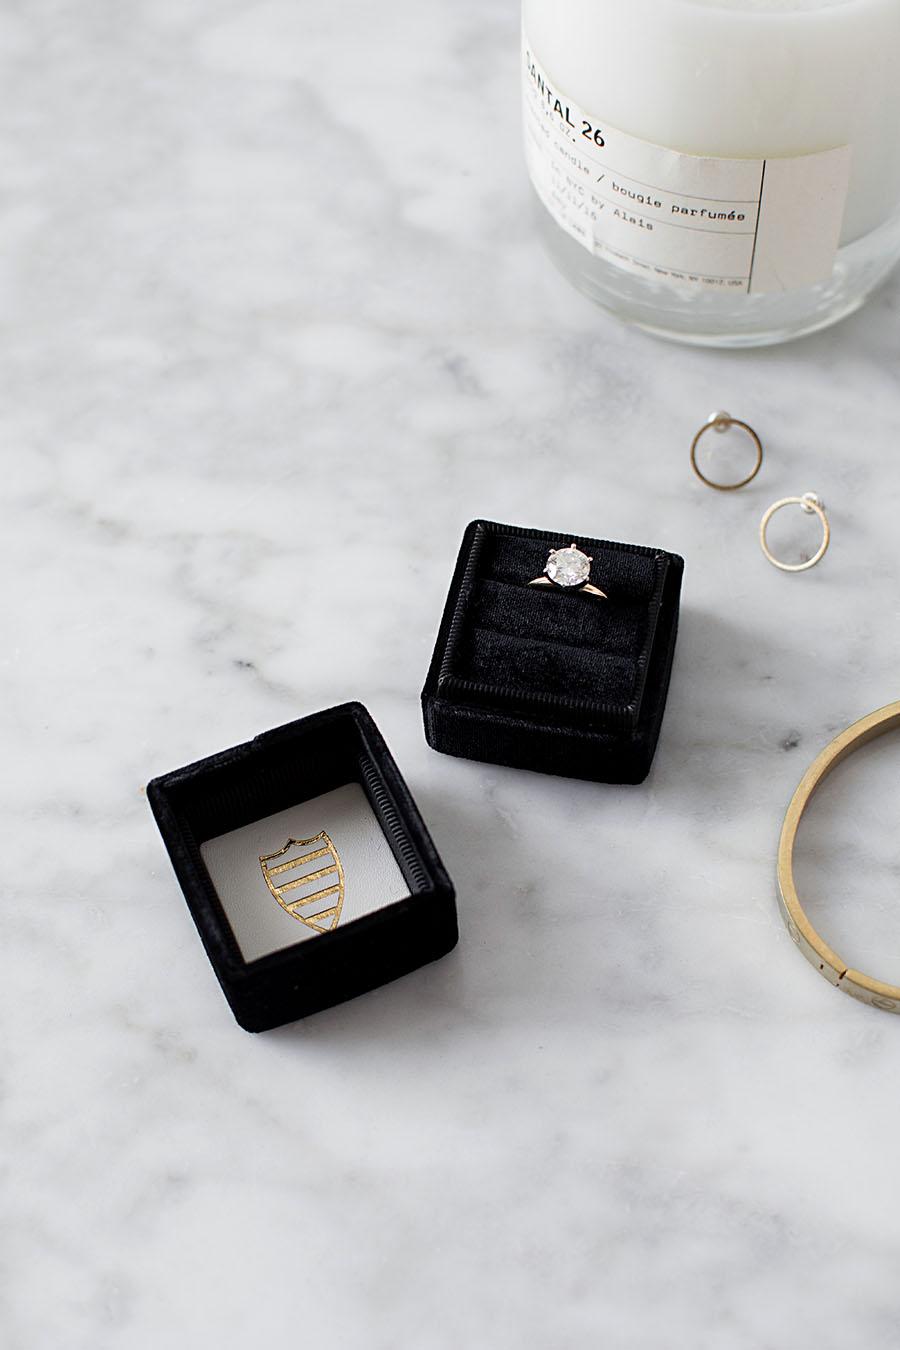 Double Wedding Ring Box 2 Stunning I told ya it